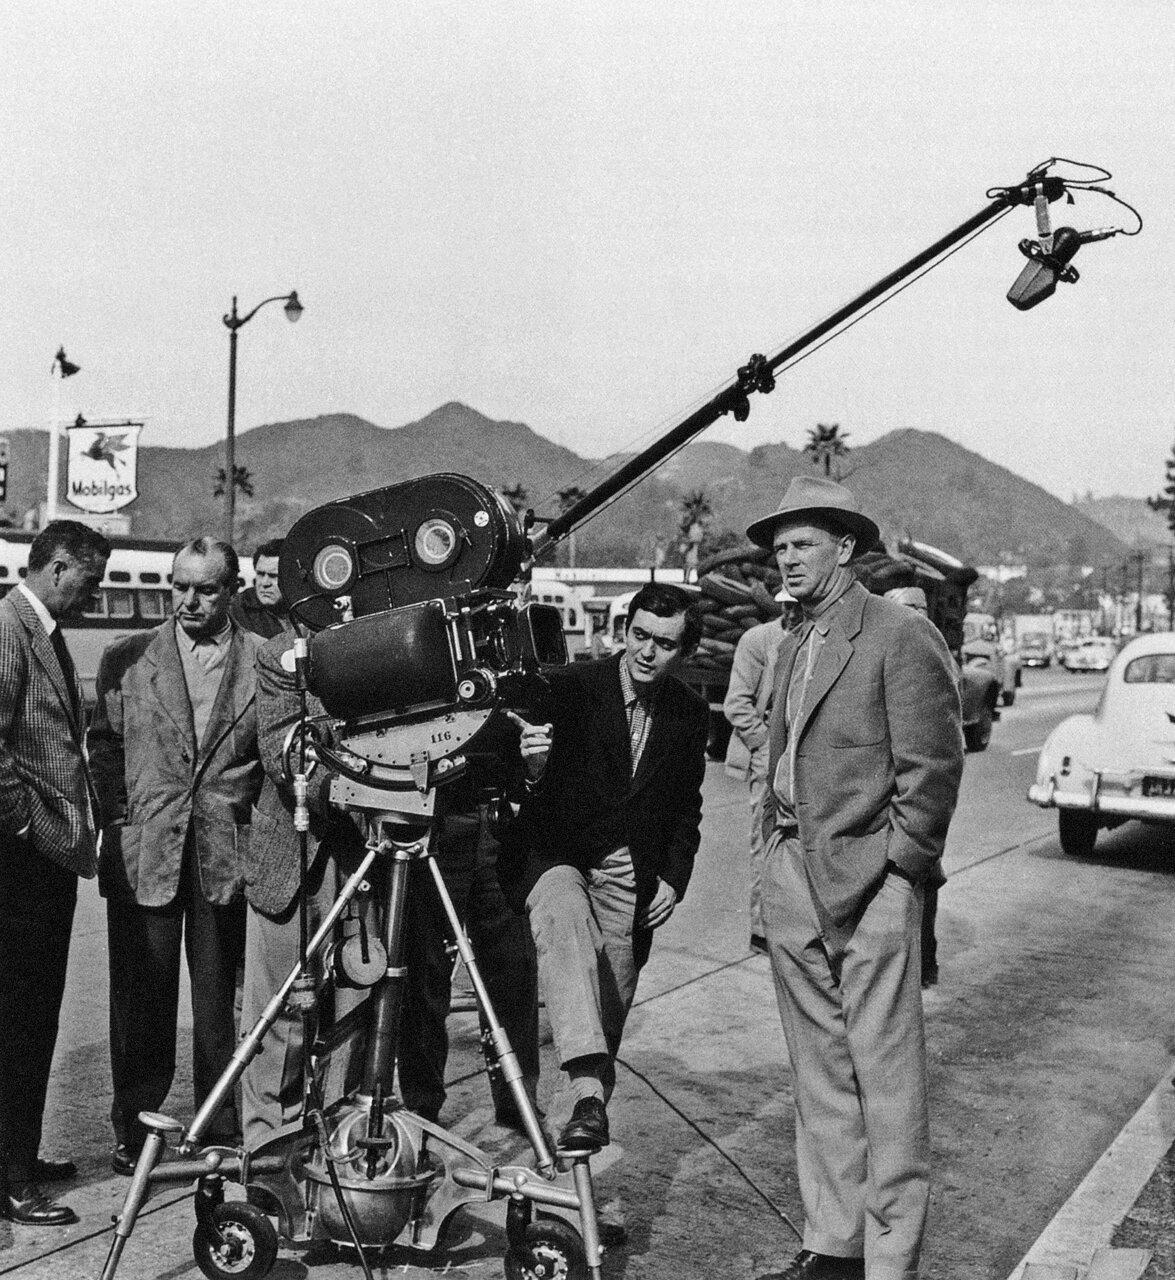 1956. Стэнли Кубрик на съемках фильма «Большой куш»